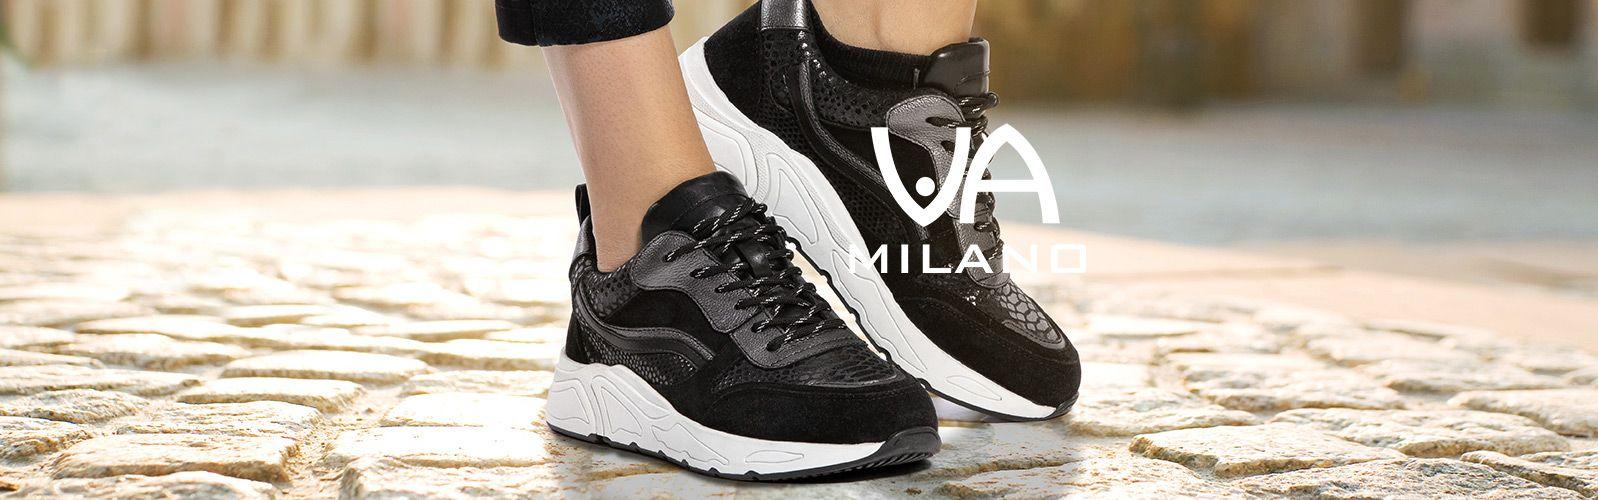 VIA MILANO Schuhe